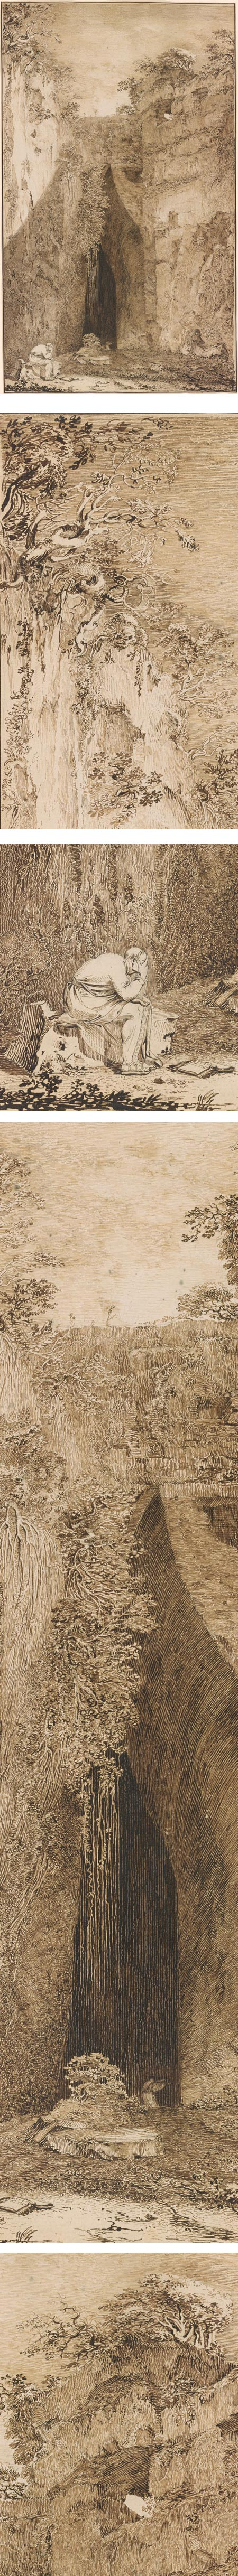 The Cave of Dionysius, Syracuse; John Brown, pen and brown ink